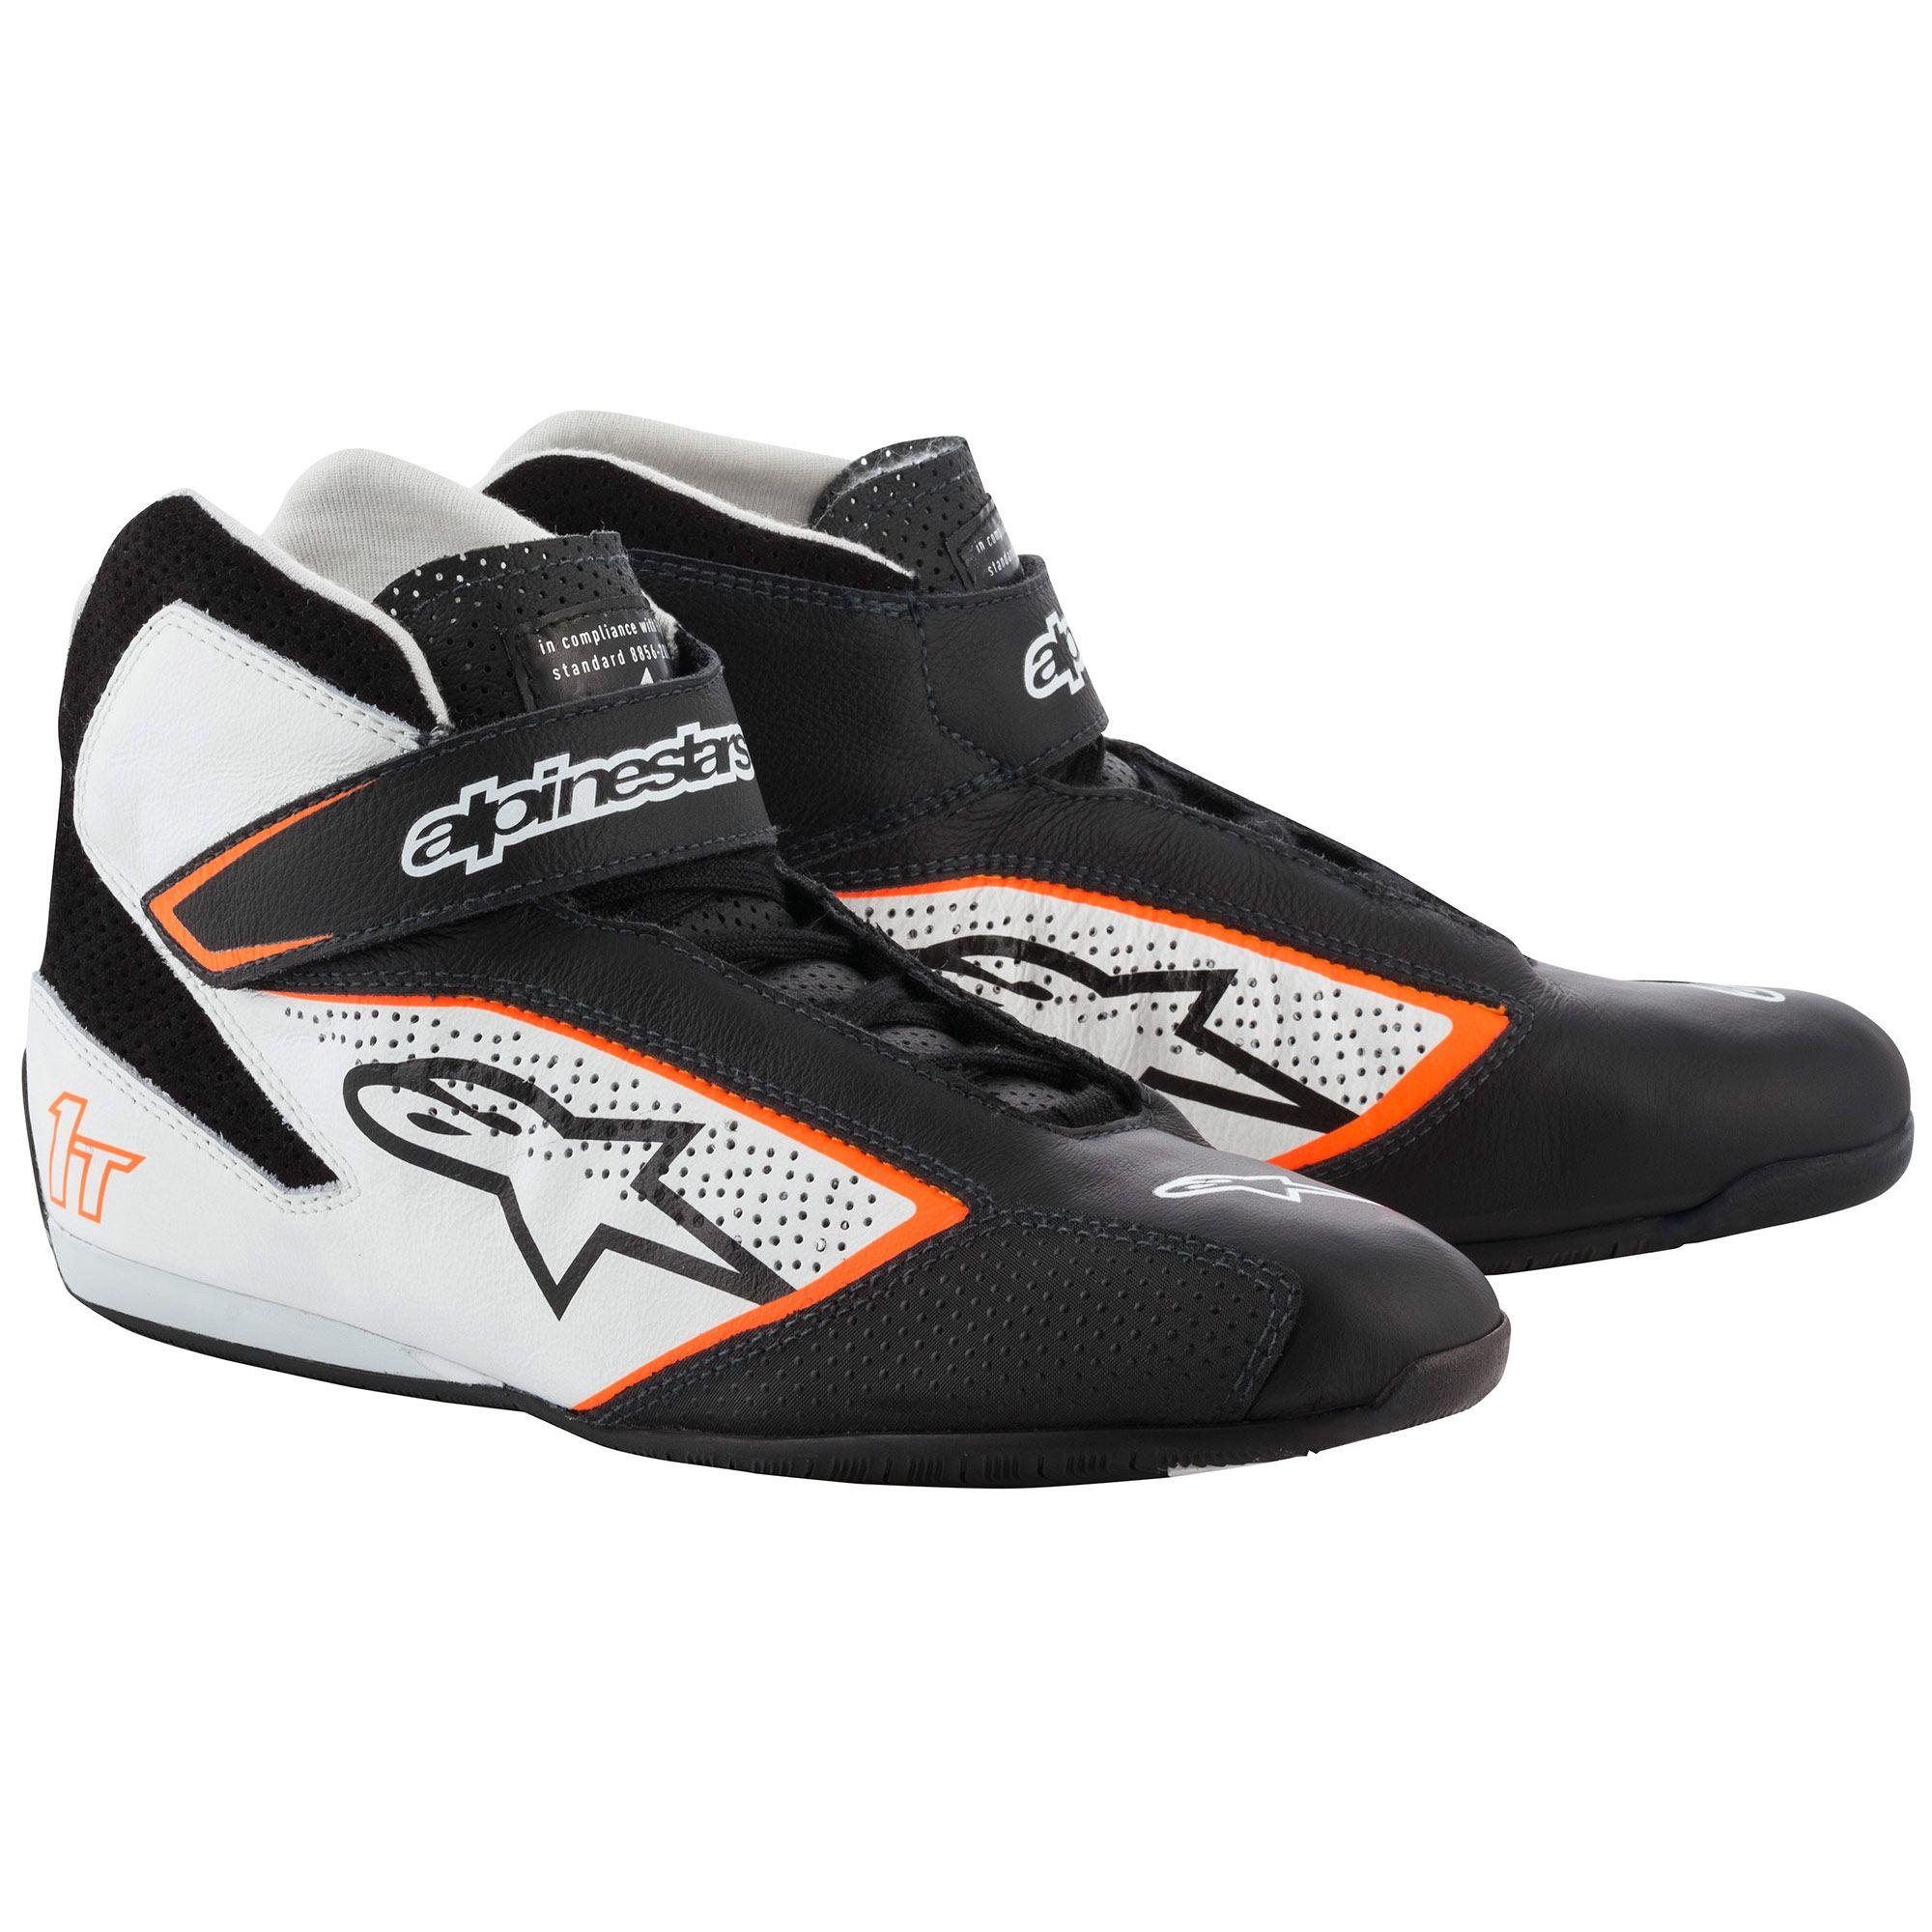 Alpinestars Tech 1-T Race Shoes black/white/fluro orange